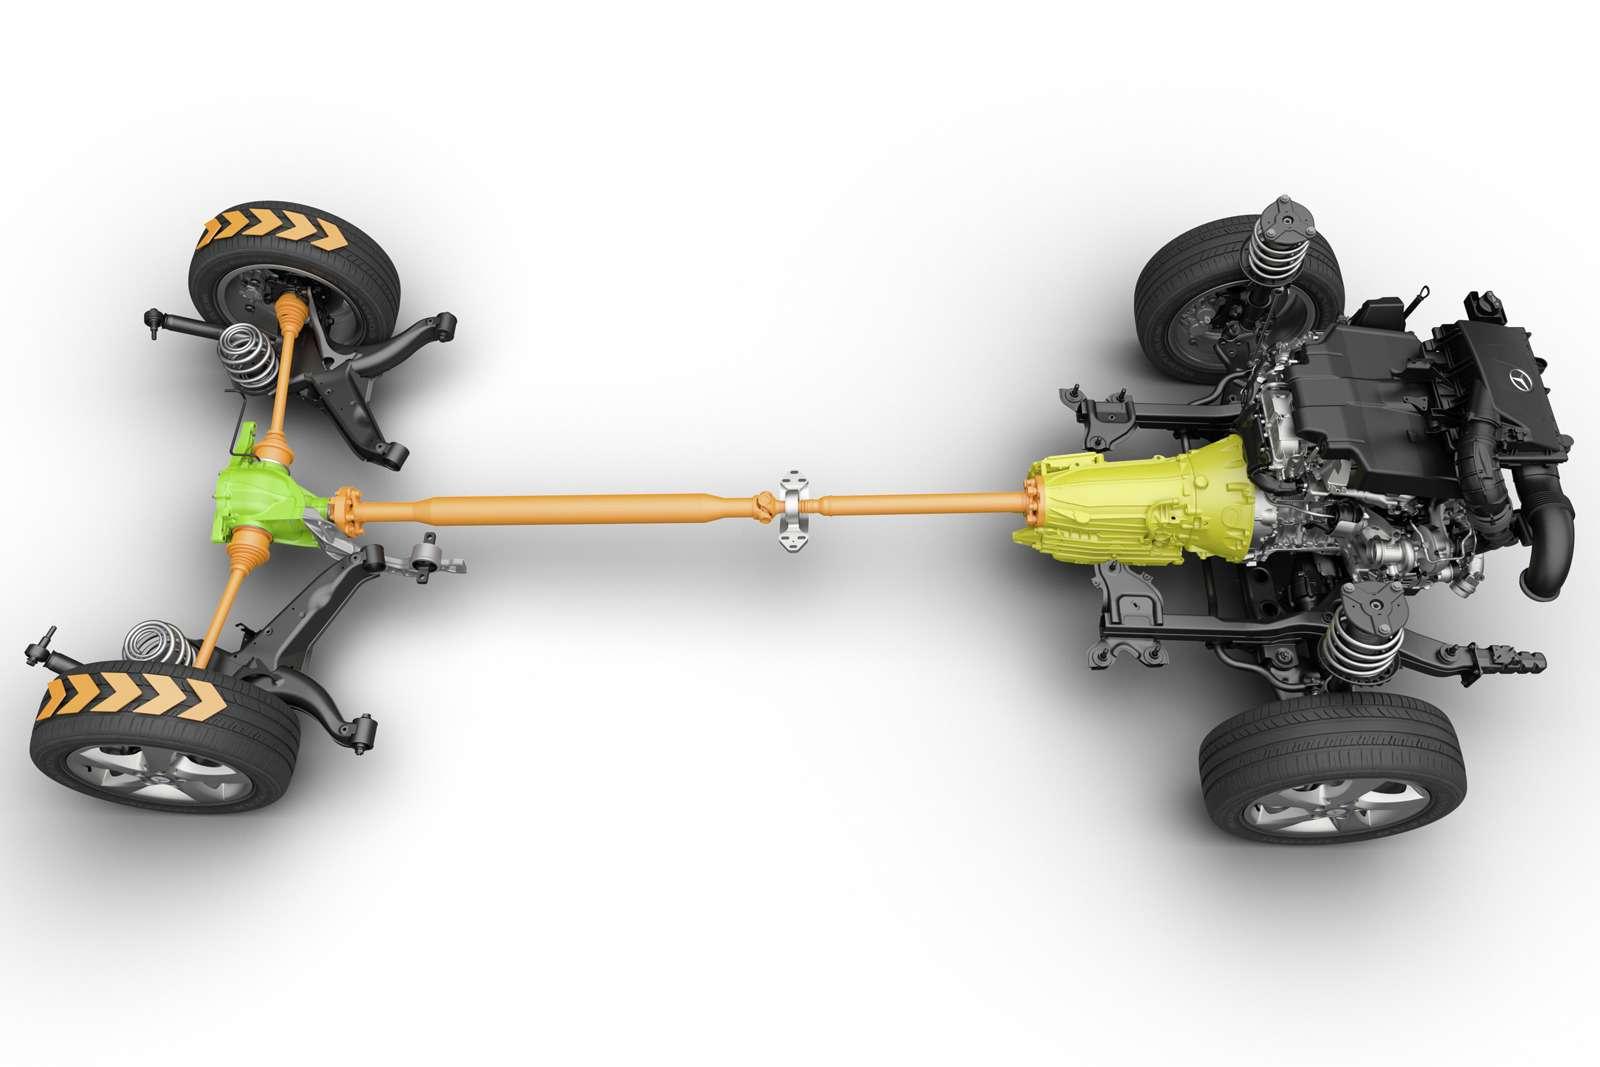 Derneue Vito— HinterradantriebThe New Vito – rear-wheel drive